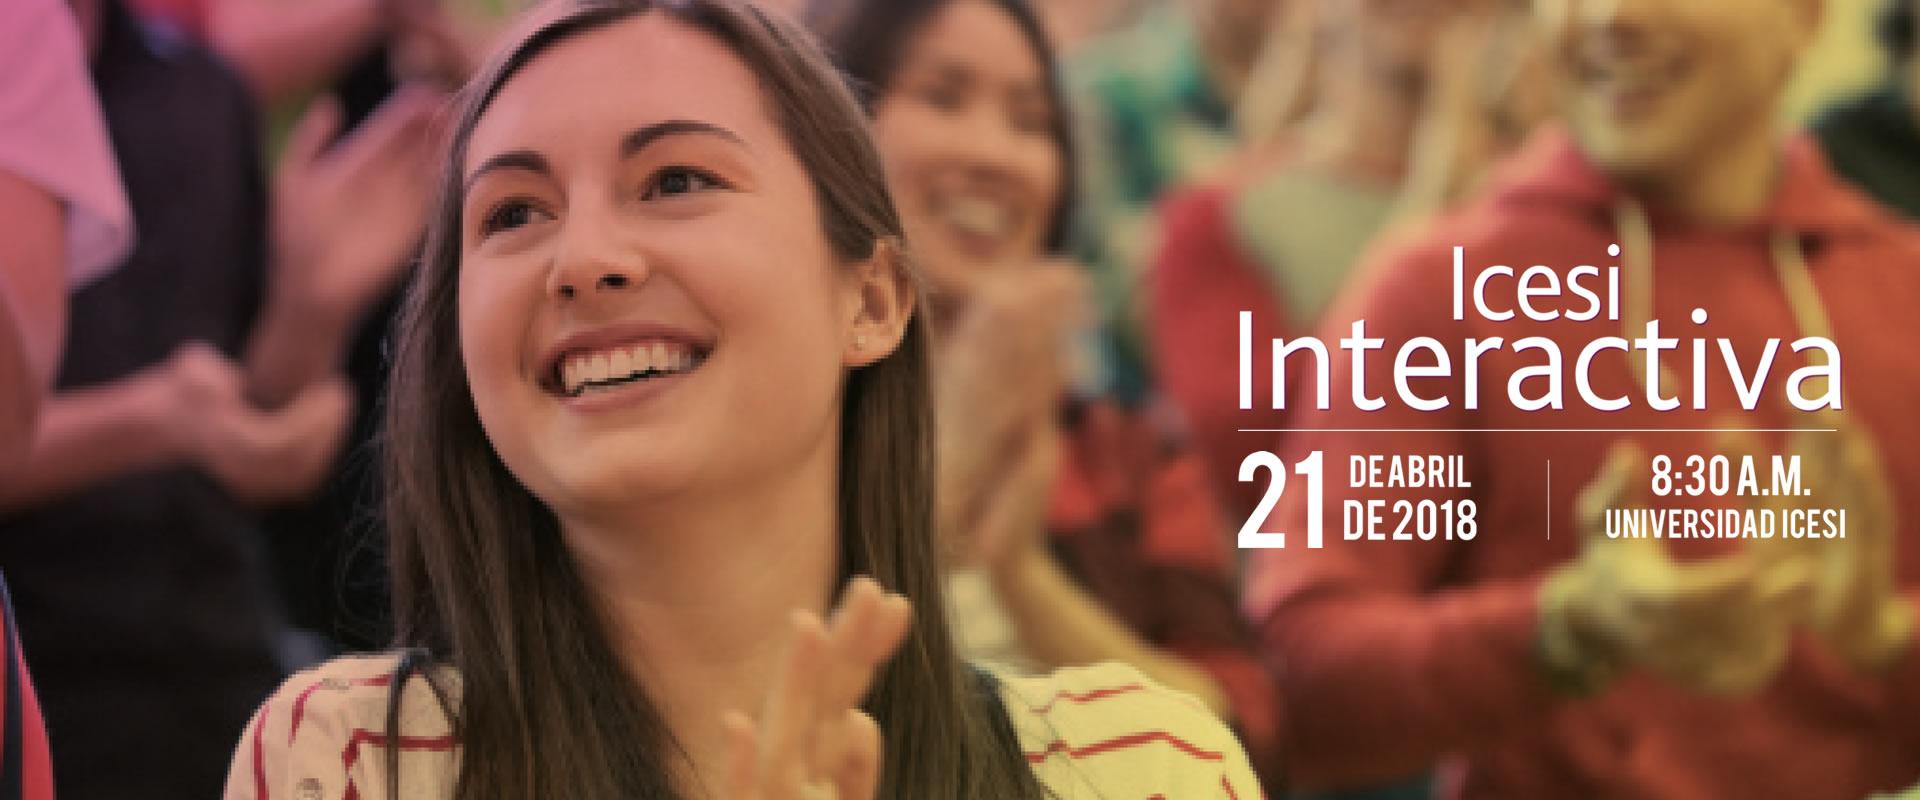 Elige tu carrera en Icesi Interactiva